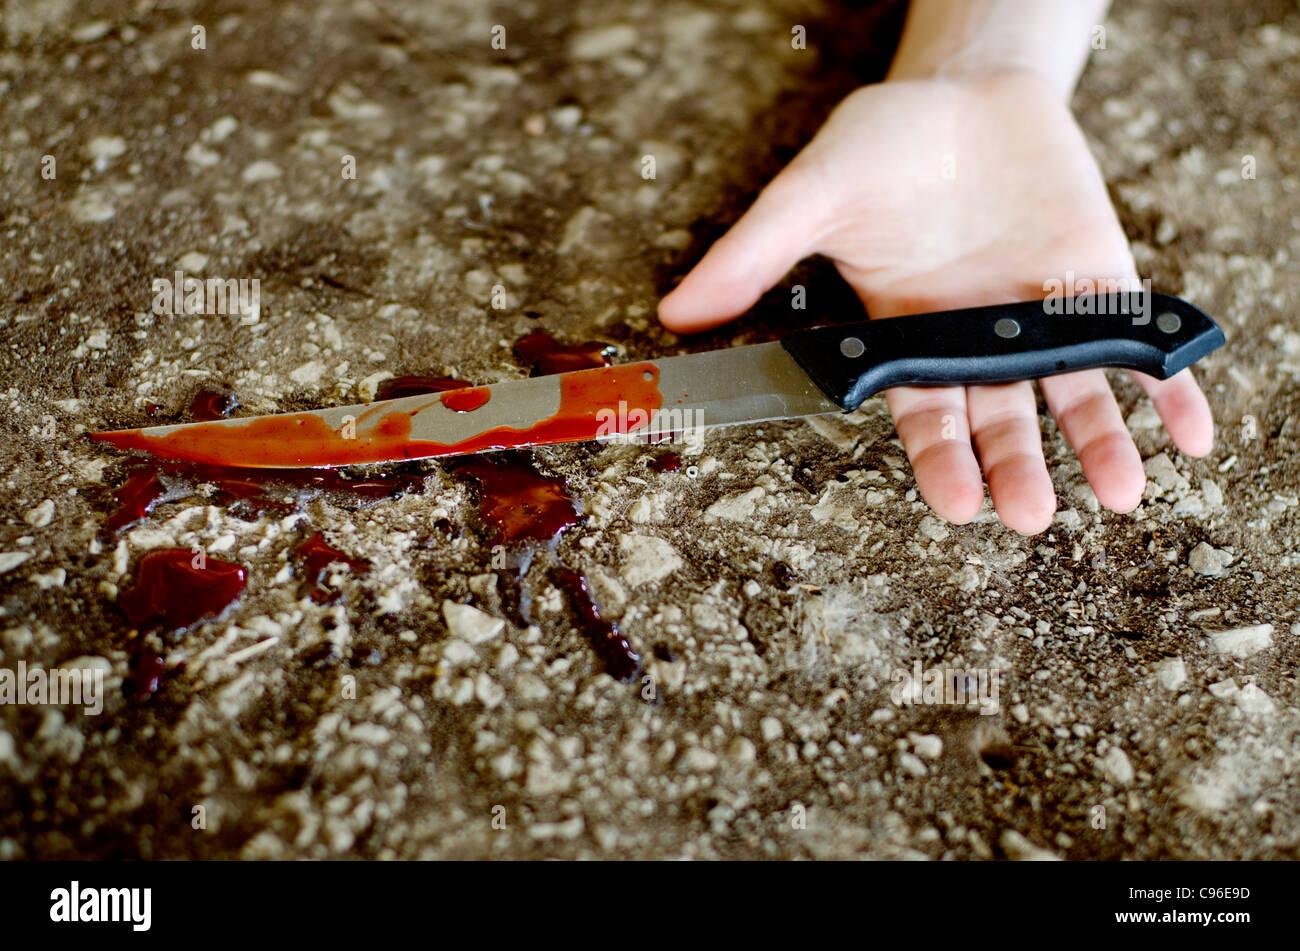 Knife Hand Violence - Stock Image